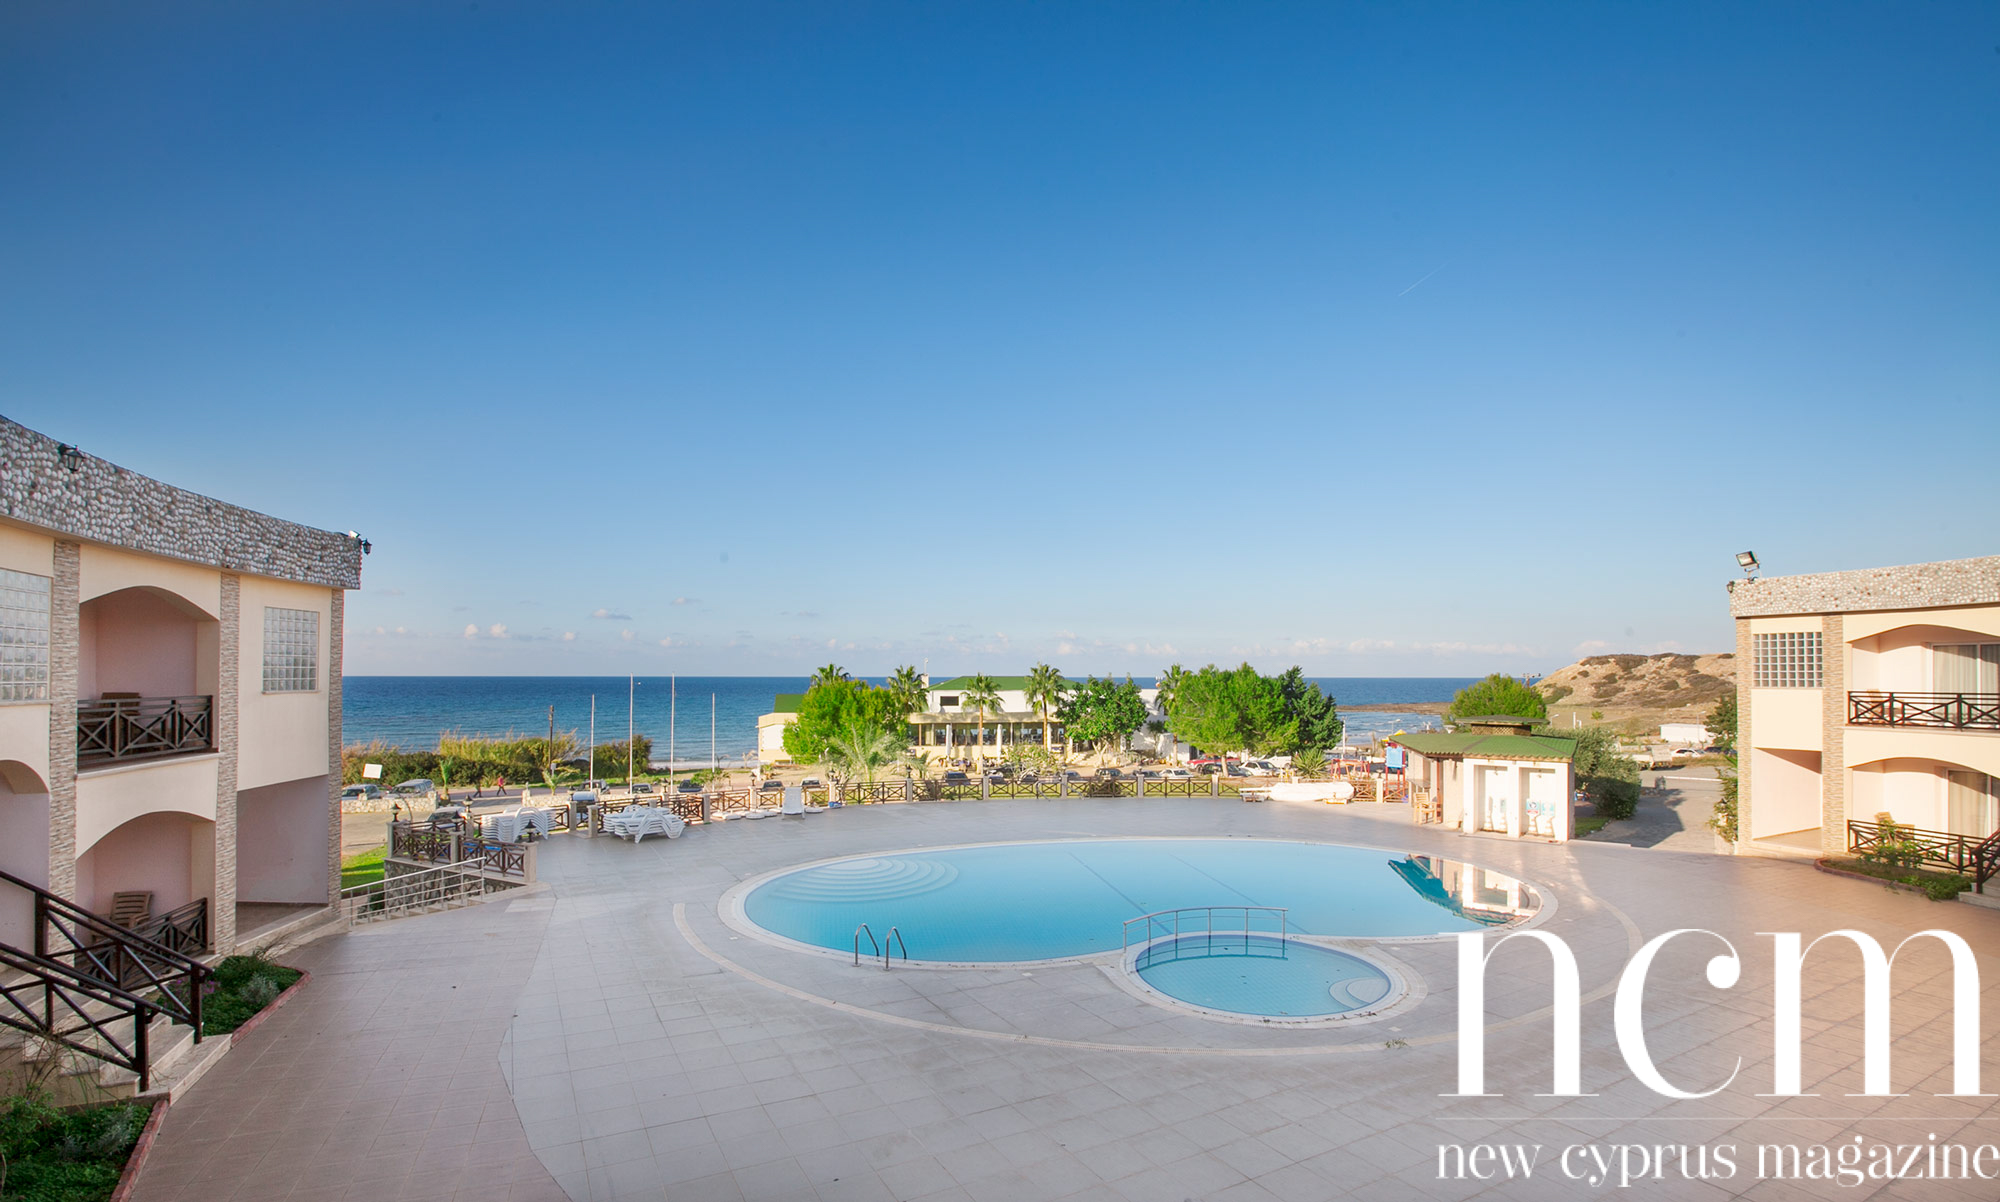 Kaplica Beach Hotell Norra Cypern